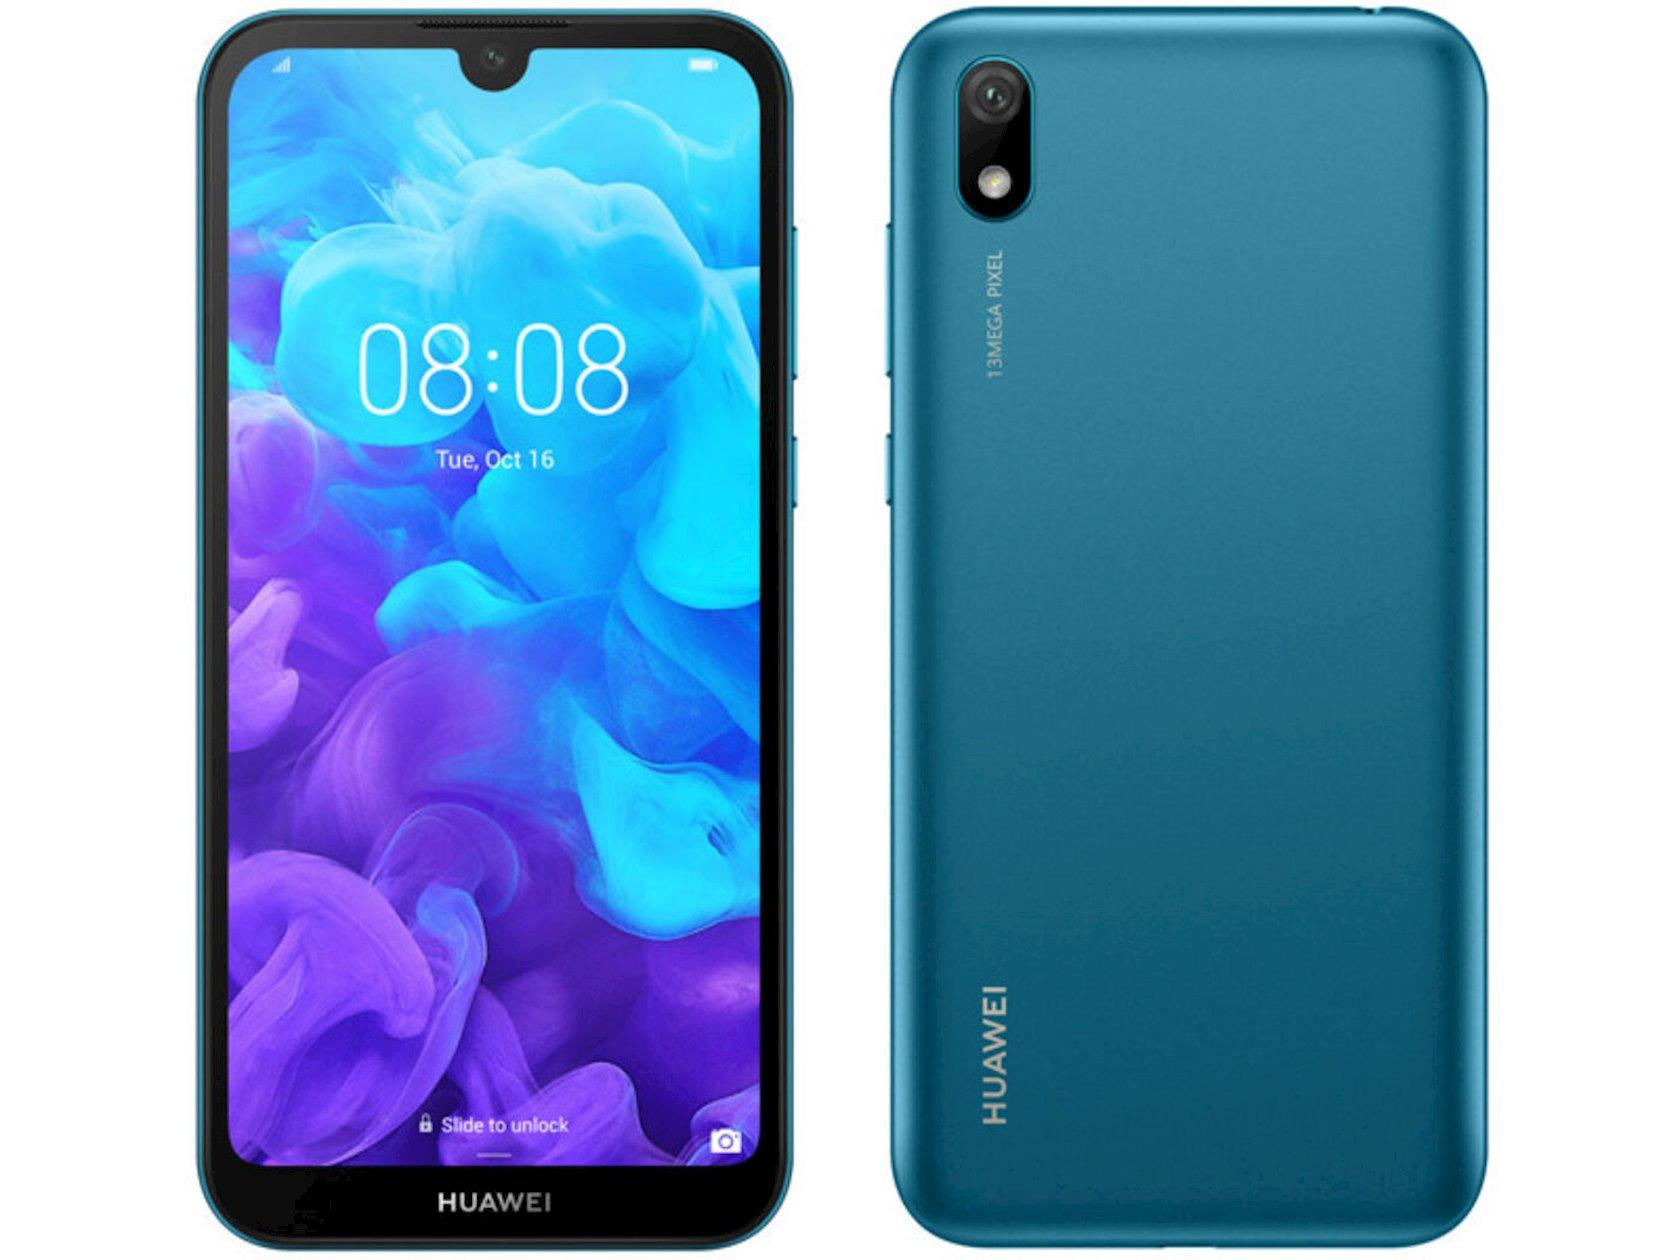 Smartfon Huawei Y5 2019 2GB/32GB Sapphire Blue